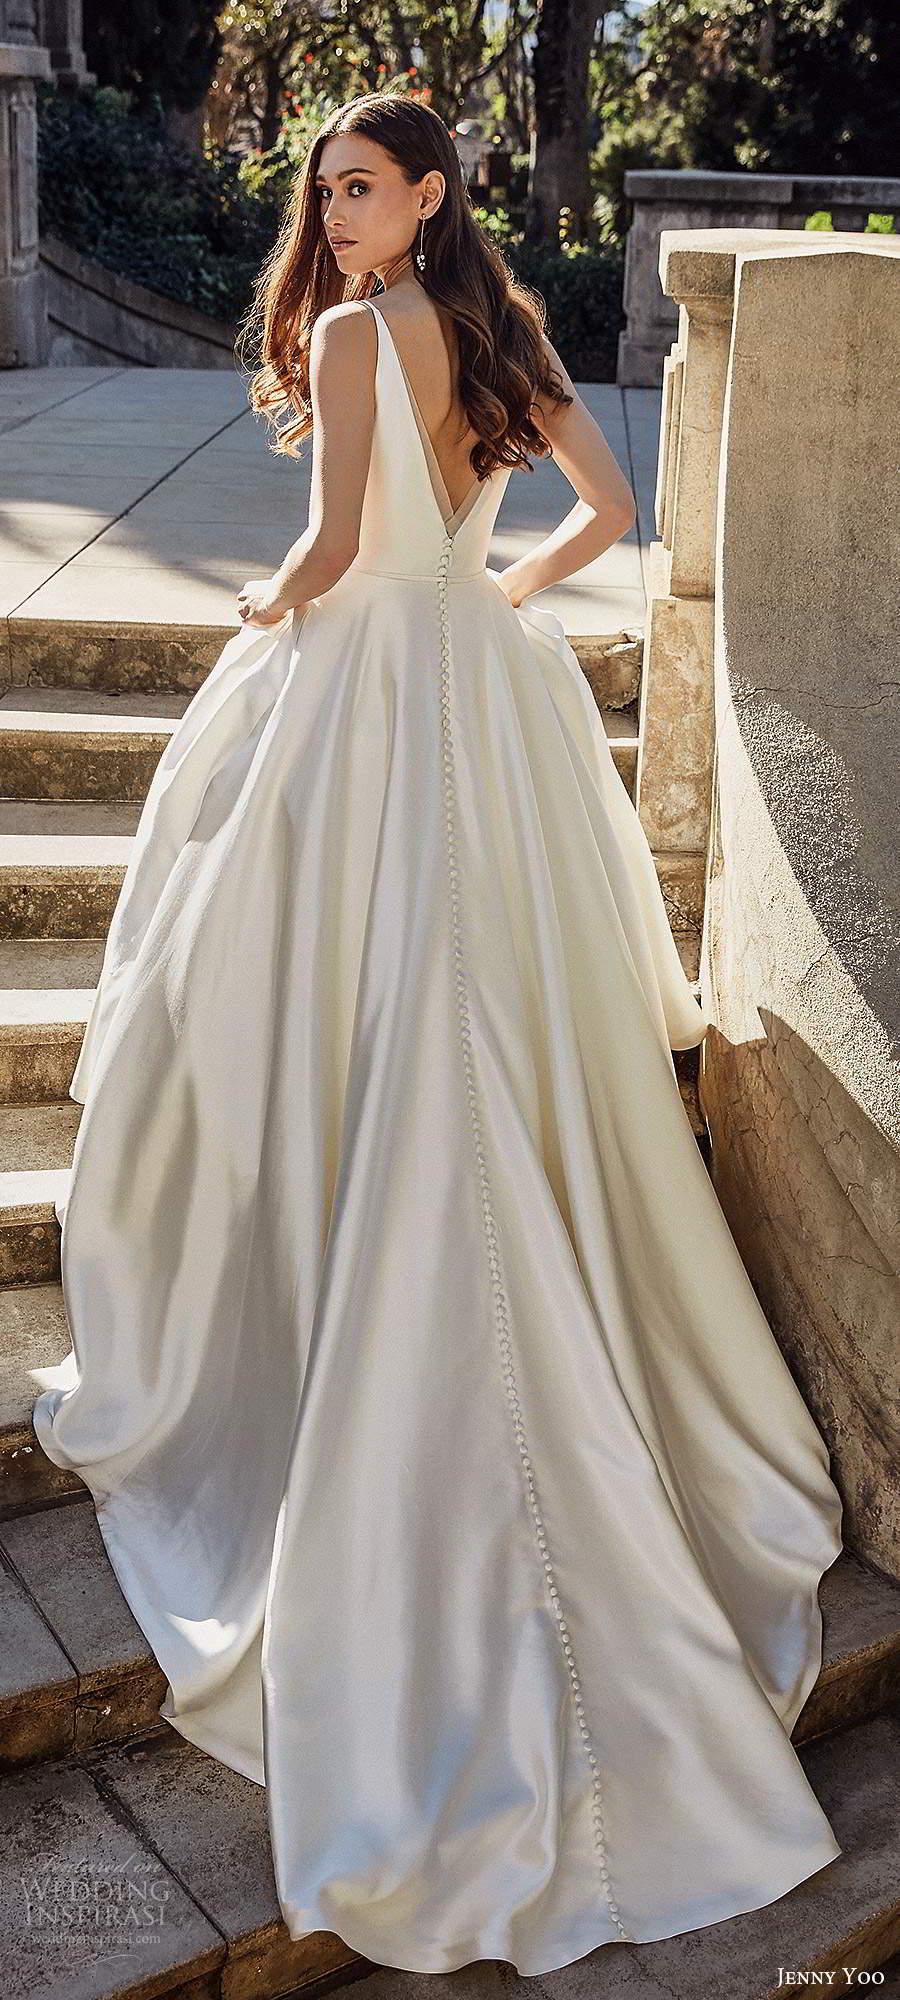 jenny yoo spring 2020 bridal sleeeless straps v neckline minimalist clean a line ball gown wedding dress v back chapel train (5) lbv